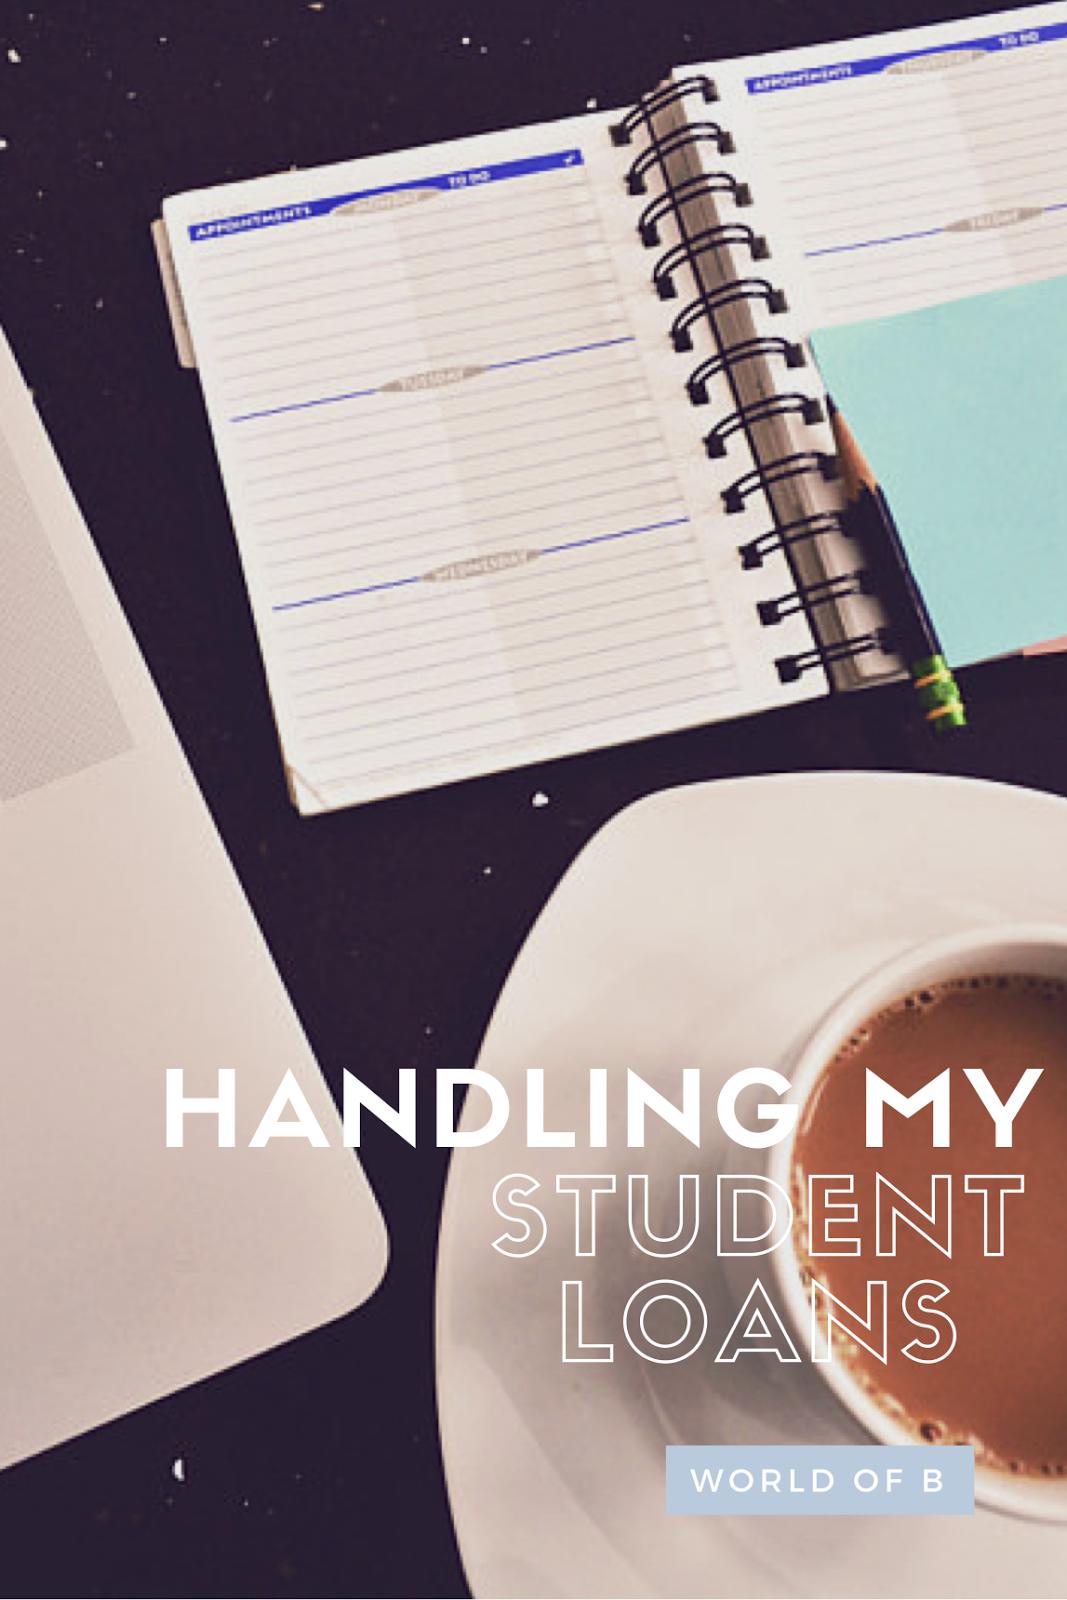 Handling My Student Loans